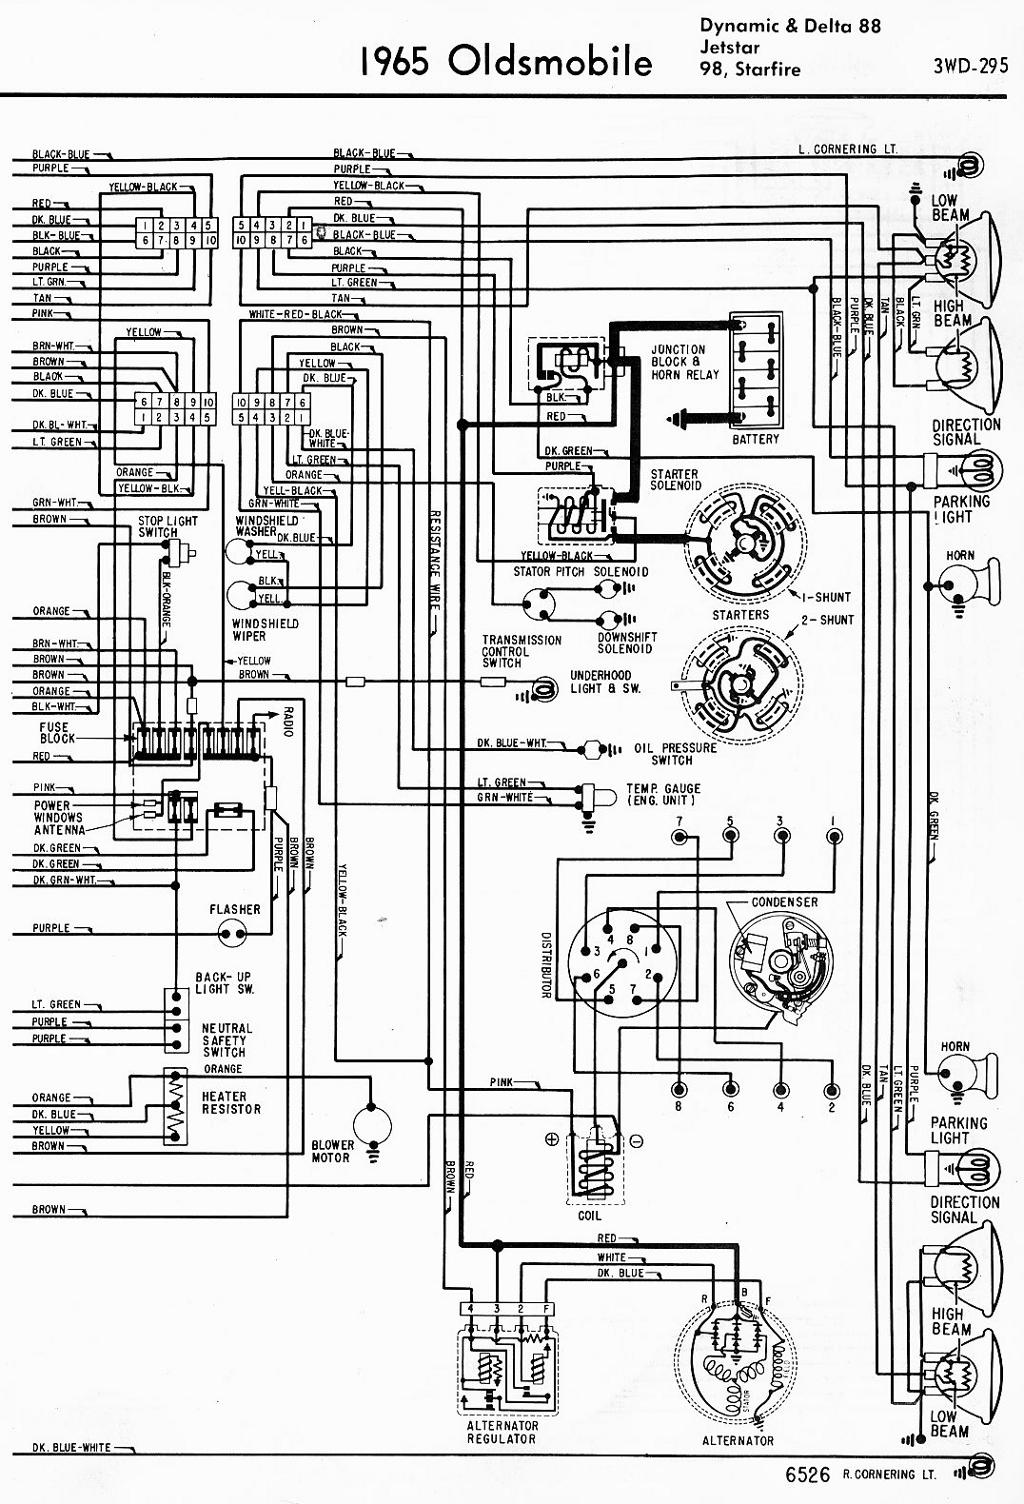 1995 Oldsmobile Silhouette Wiring Diagram Detailed Schematics Silverado 88 Electrical Diagrams Chevy Monte Carlo